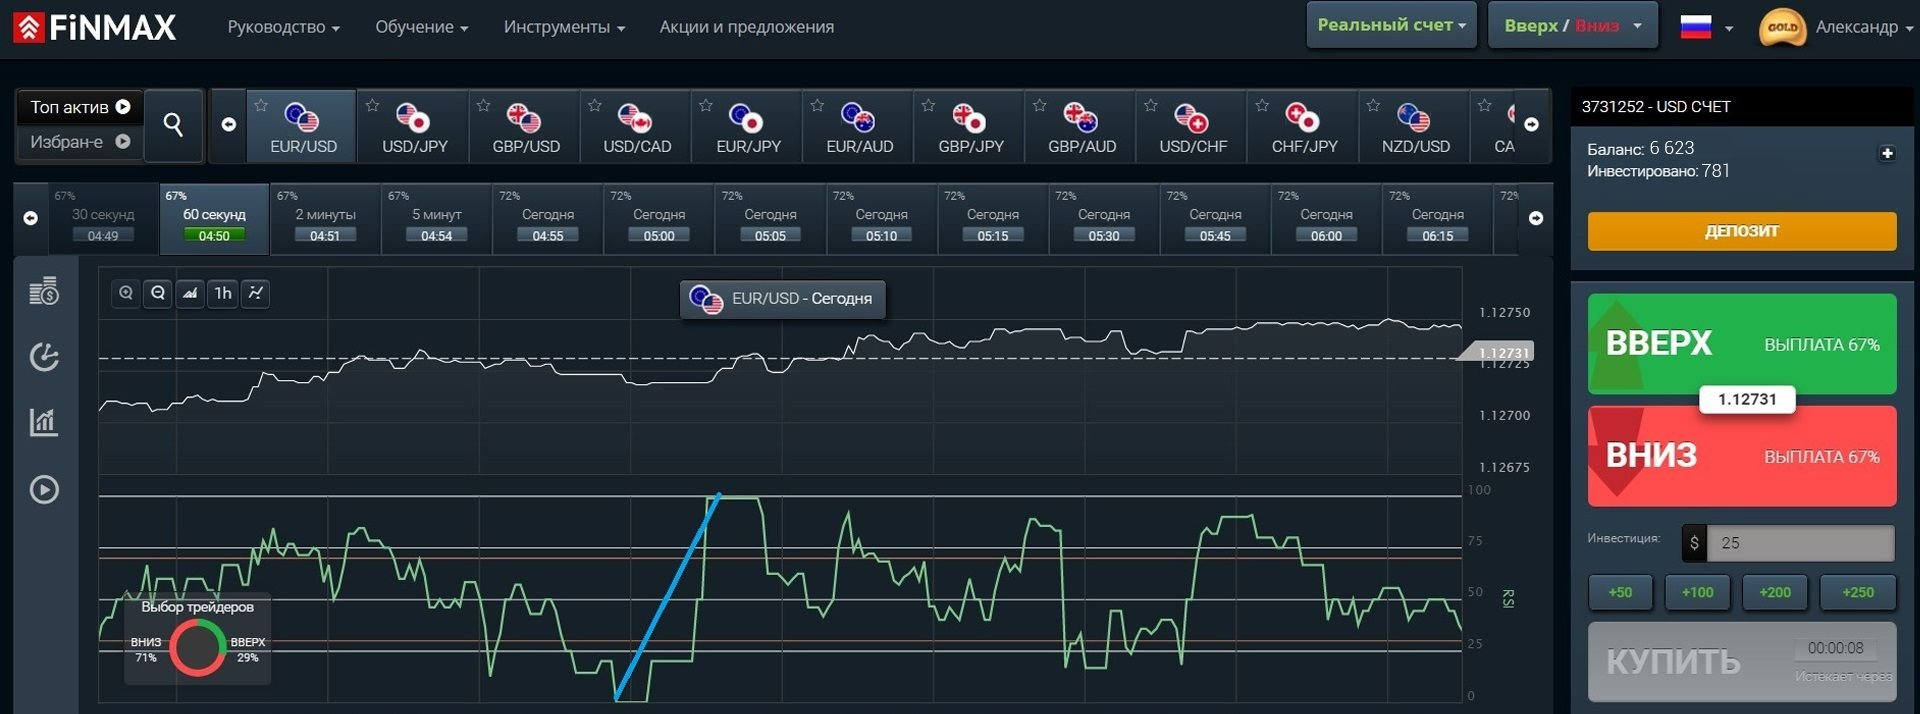 Восходящая тенденция рынка на платформе брокера FinMax